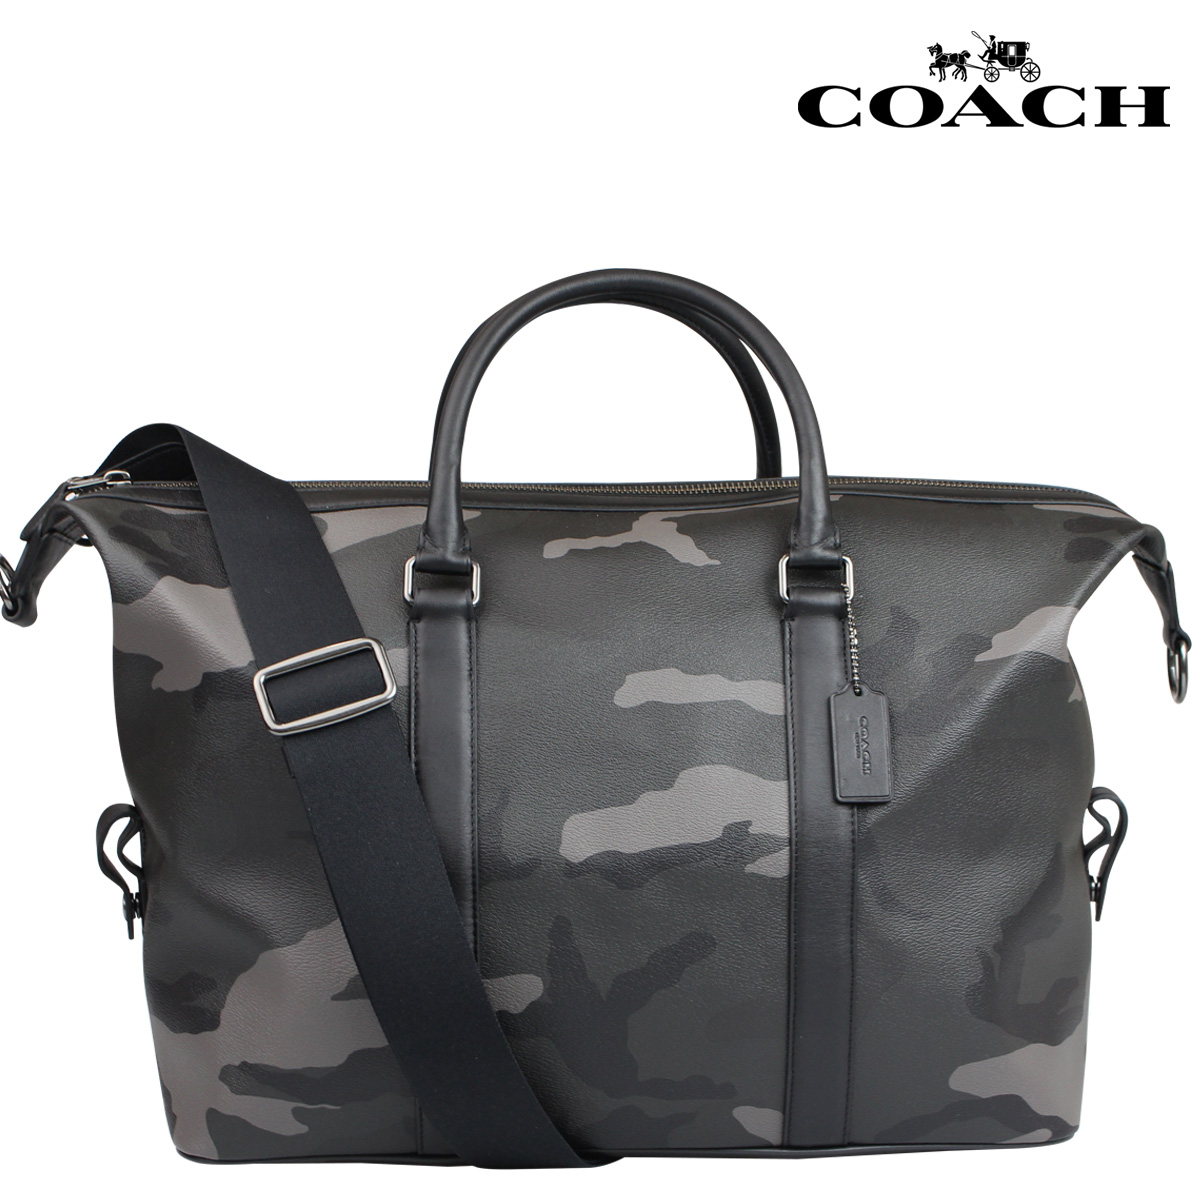 [SOLD OUT]教练COACH menzubosutombaggudaffurubaggu 2WAY F93514灰色野鸭PVC purintoekusupuroradaffuru